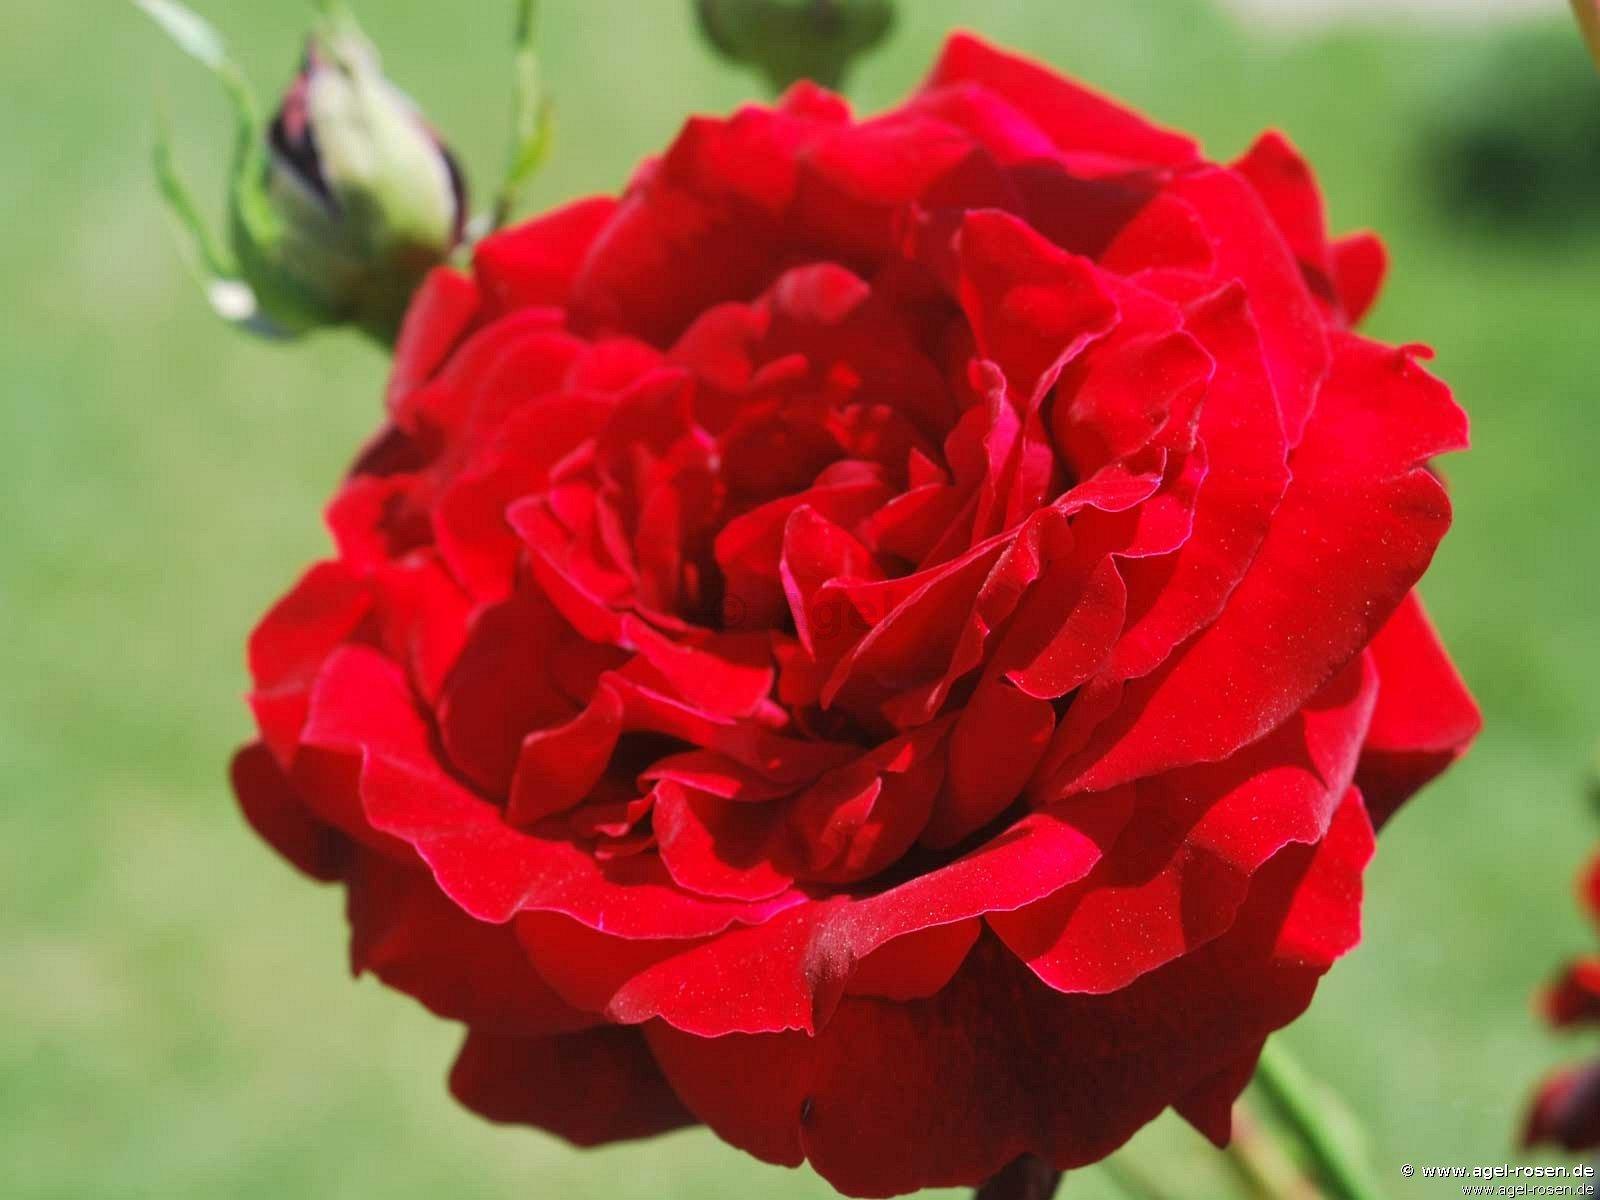 salammbo kletterrose kaufen bei agel rosen. Black Bedroom Furniture Sets. Home Design Ideas